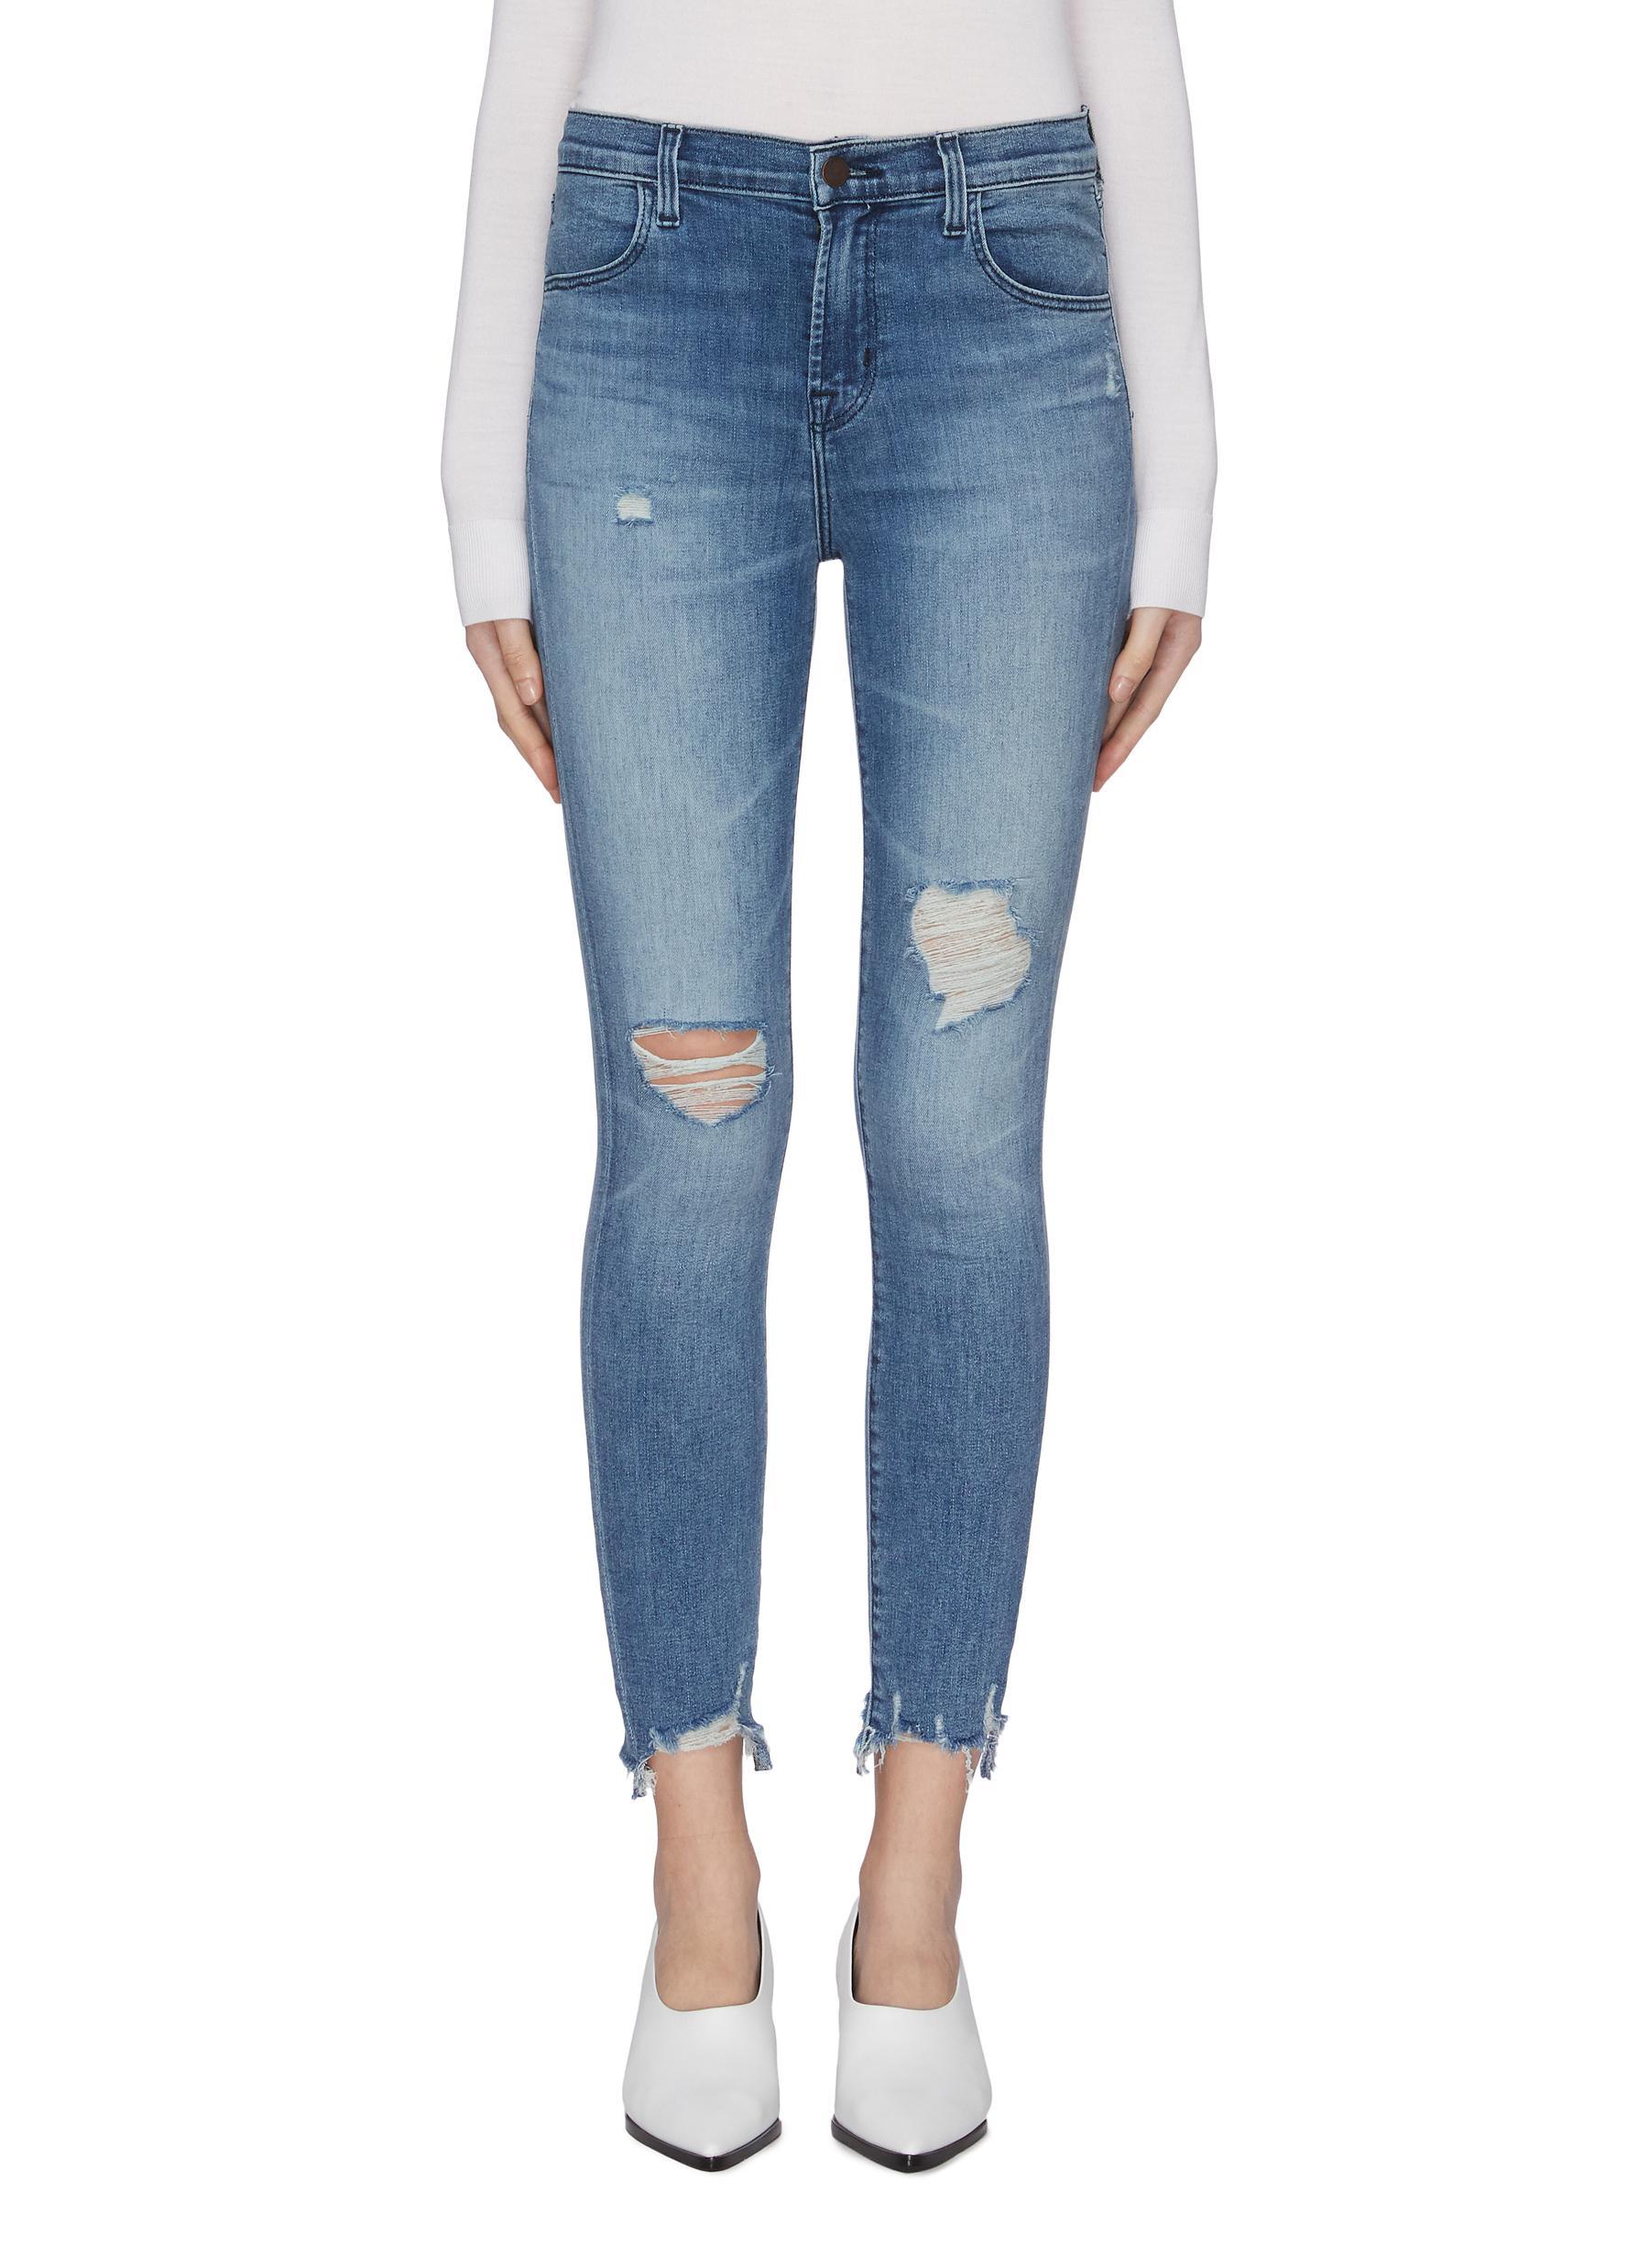 Alana ripped knee skinny jeans by J Brand